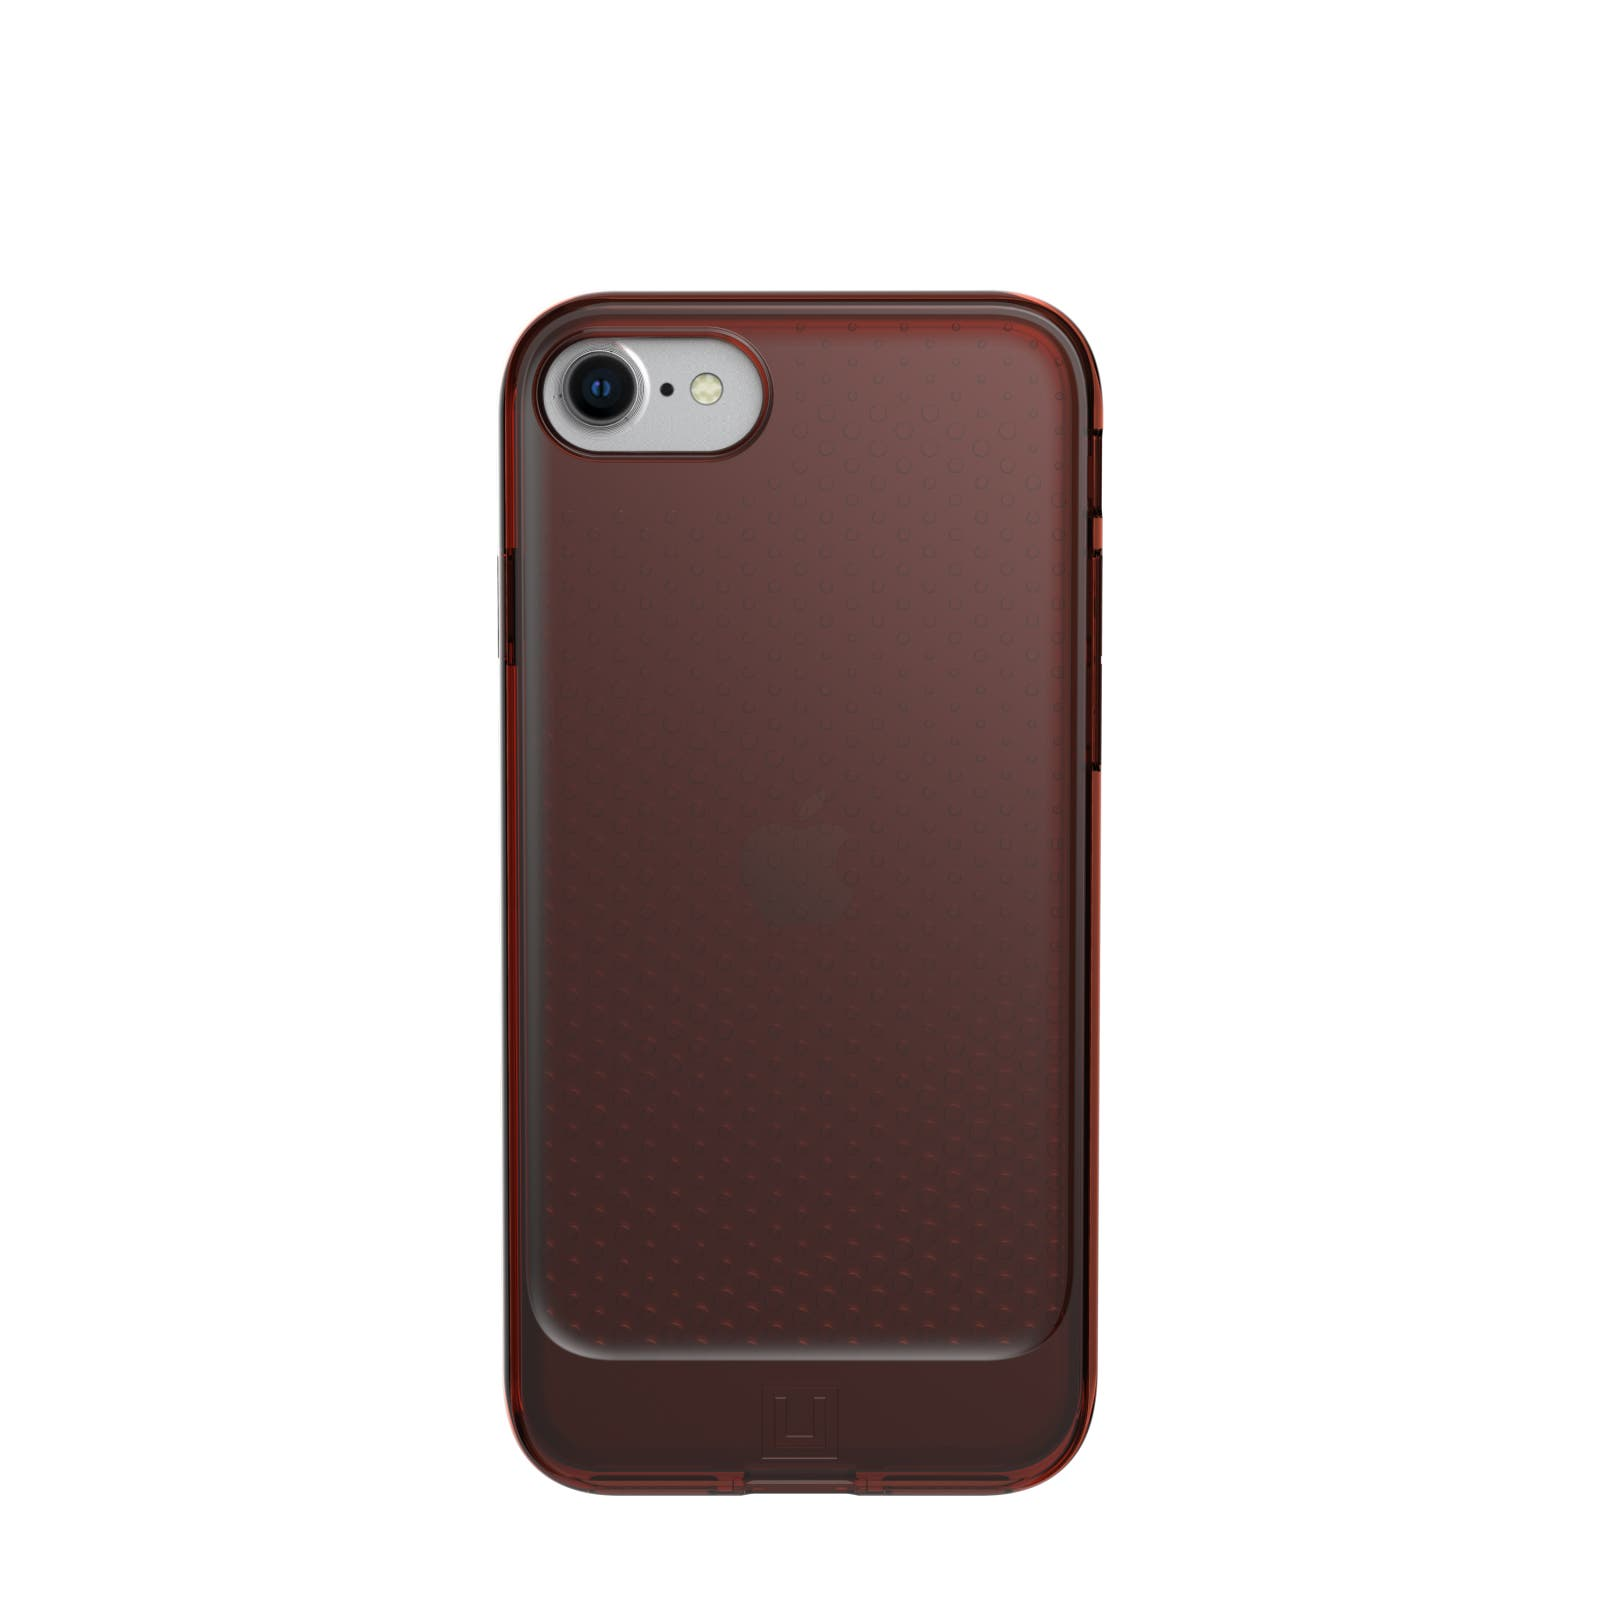 UAG [U] Lucent Case for iPhone SE / 8 / 7 - Orange